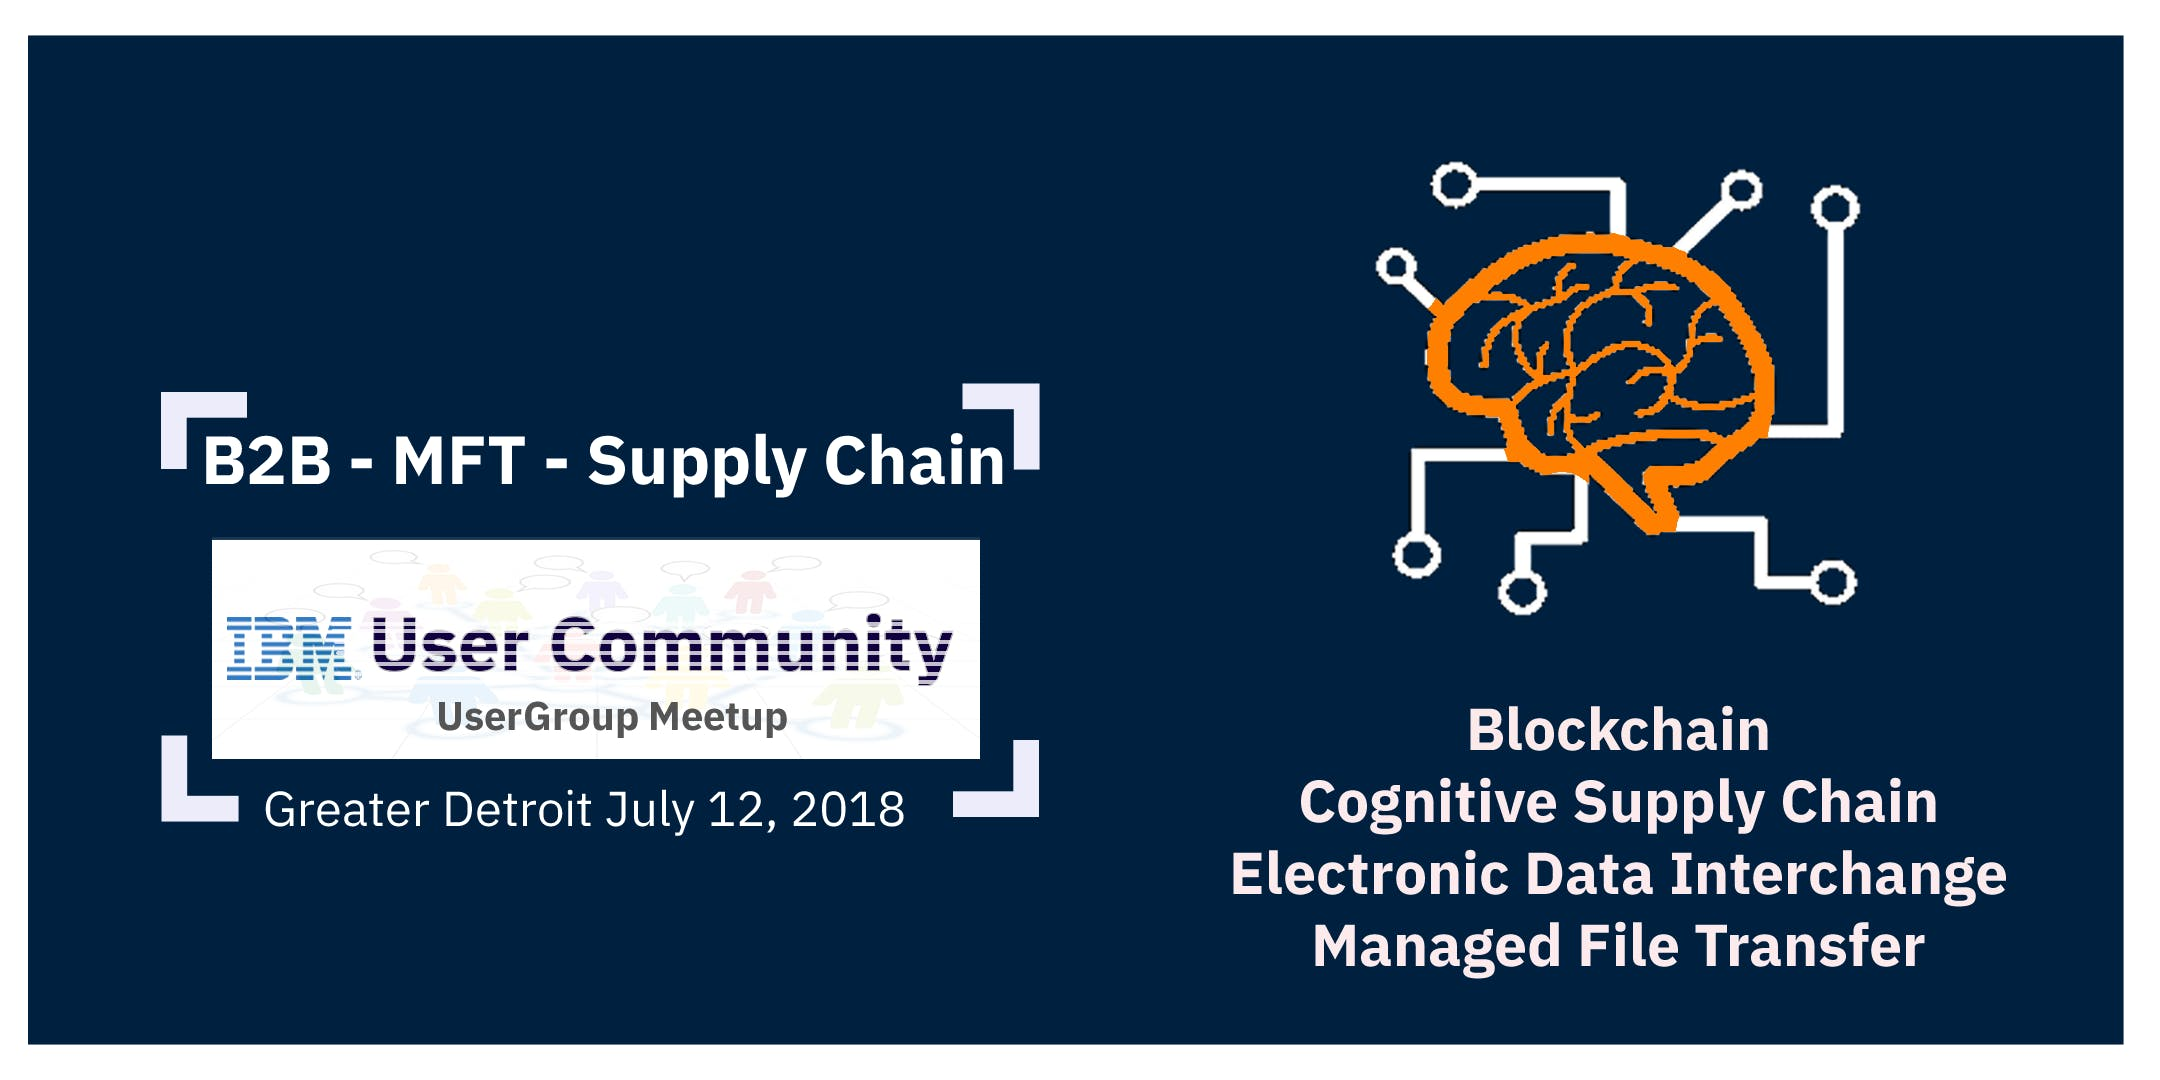 IBM B2B/MFT Integration Usergroup and Innovation Day - Detroit Chapter